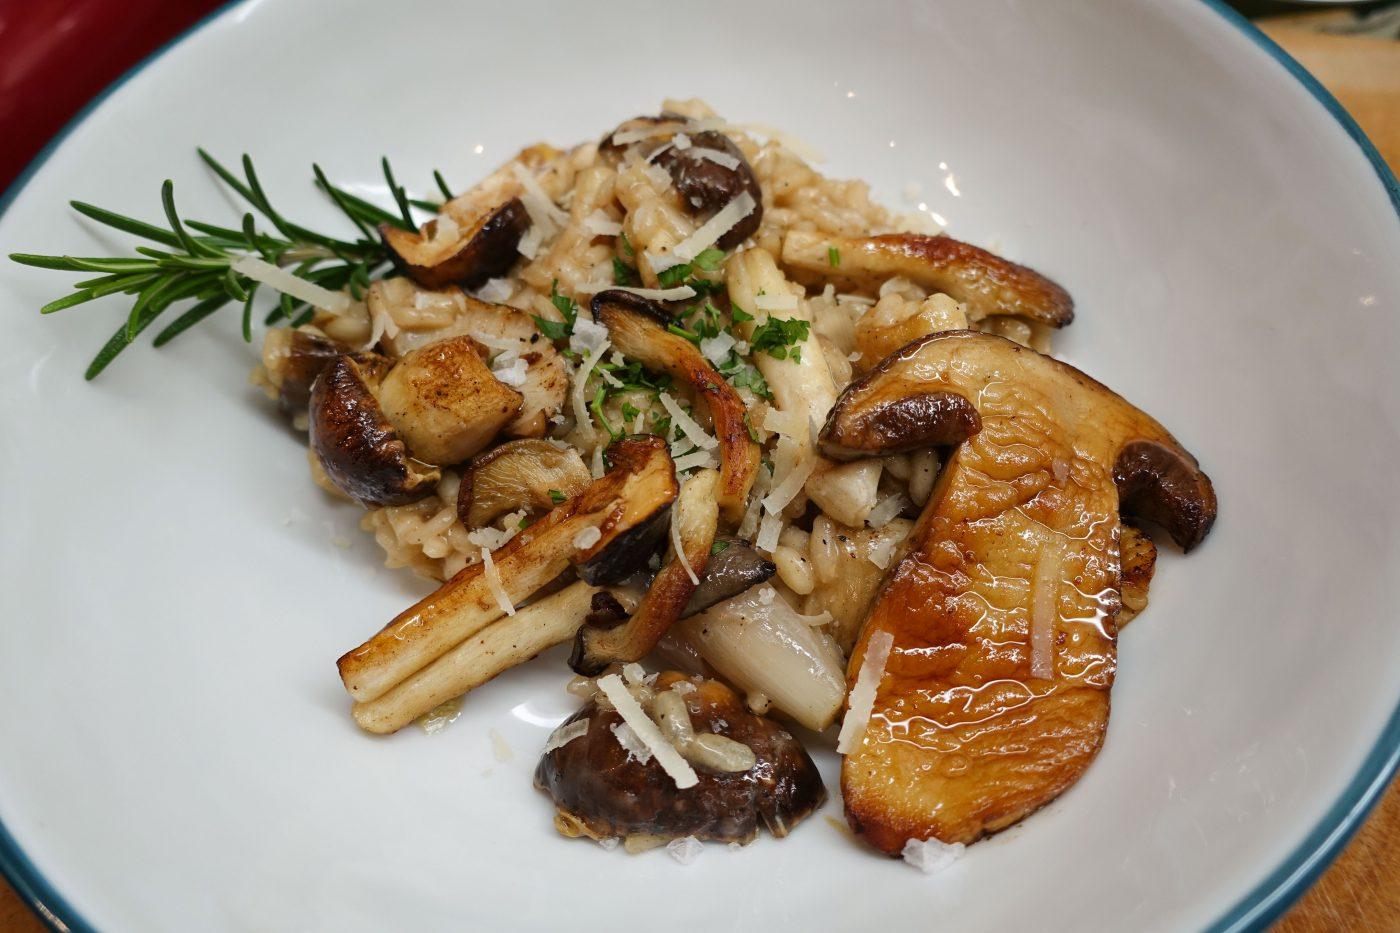 Mushroom risotto, simple, vegetarian, delicious